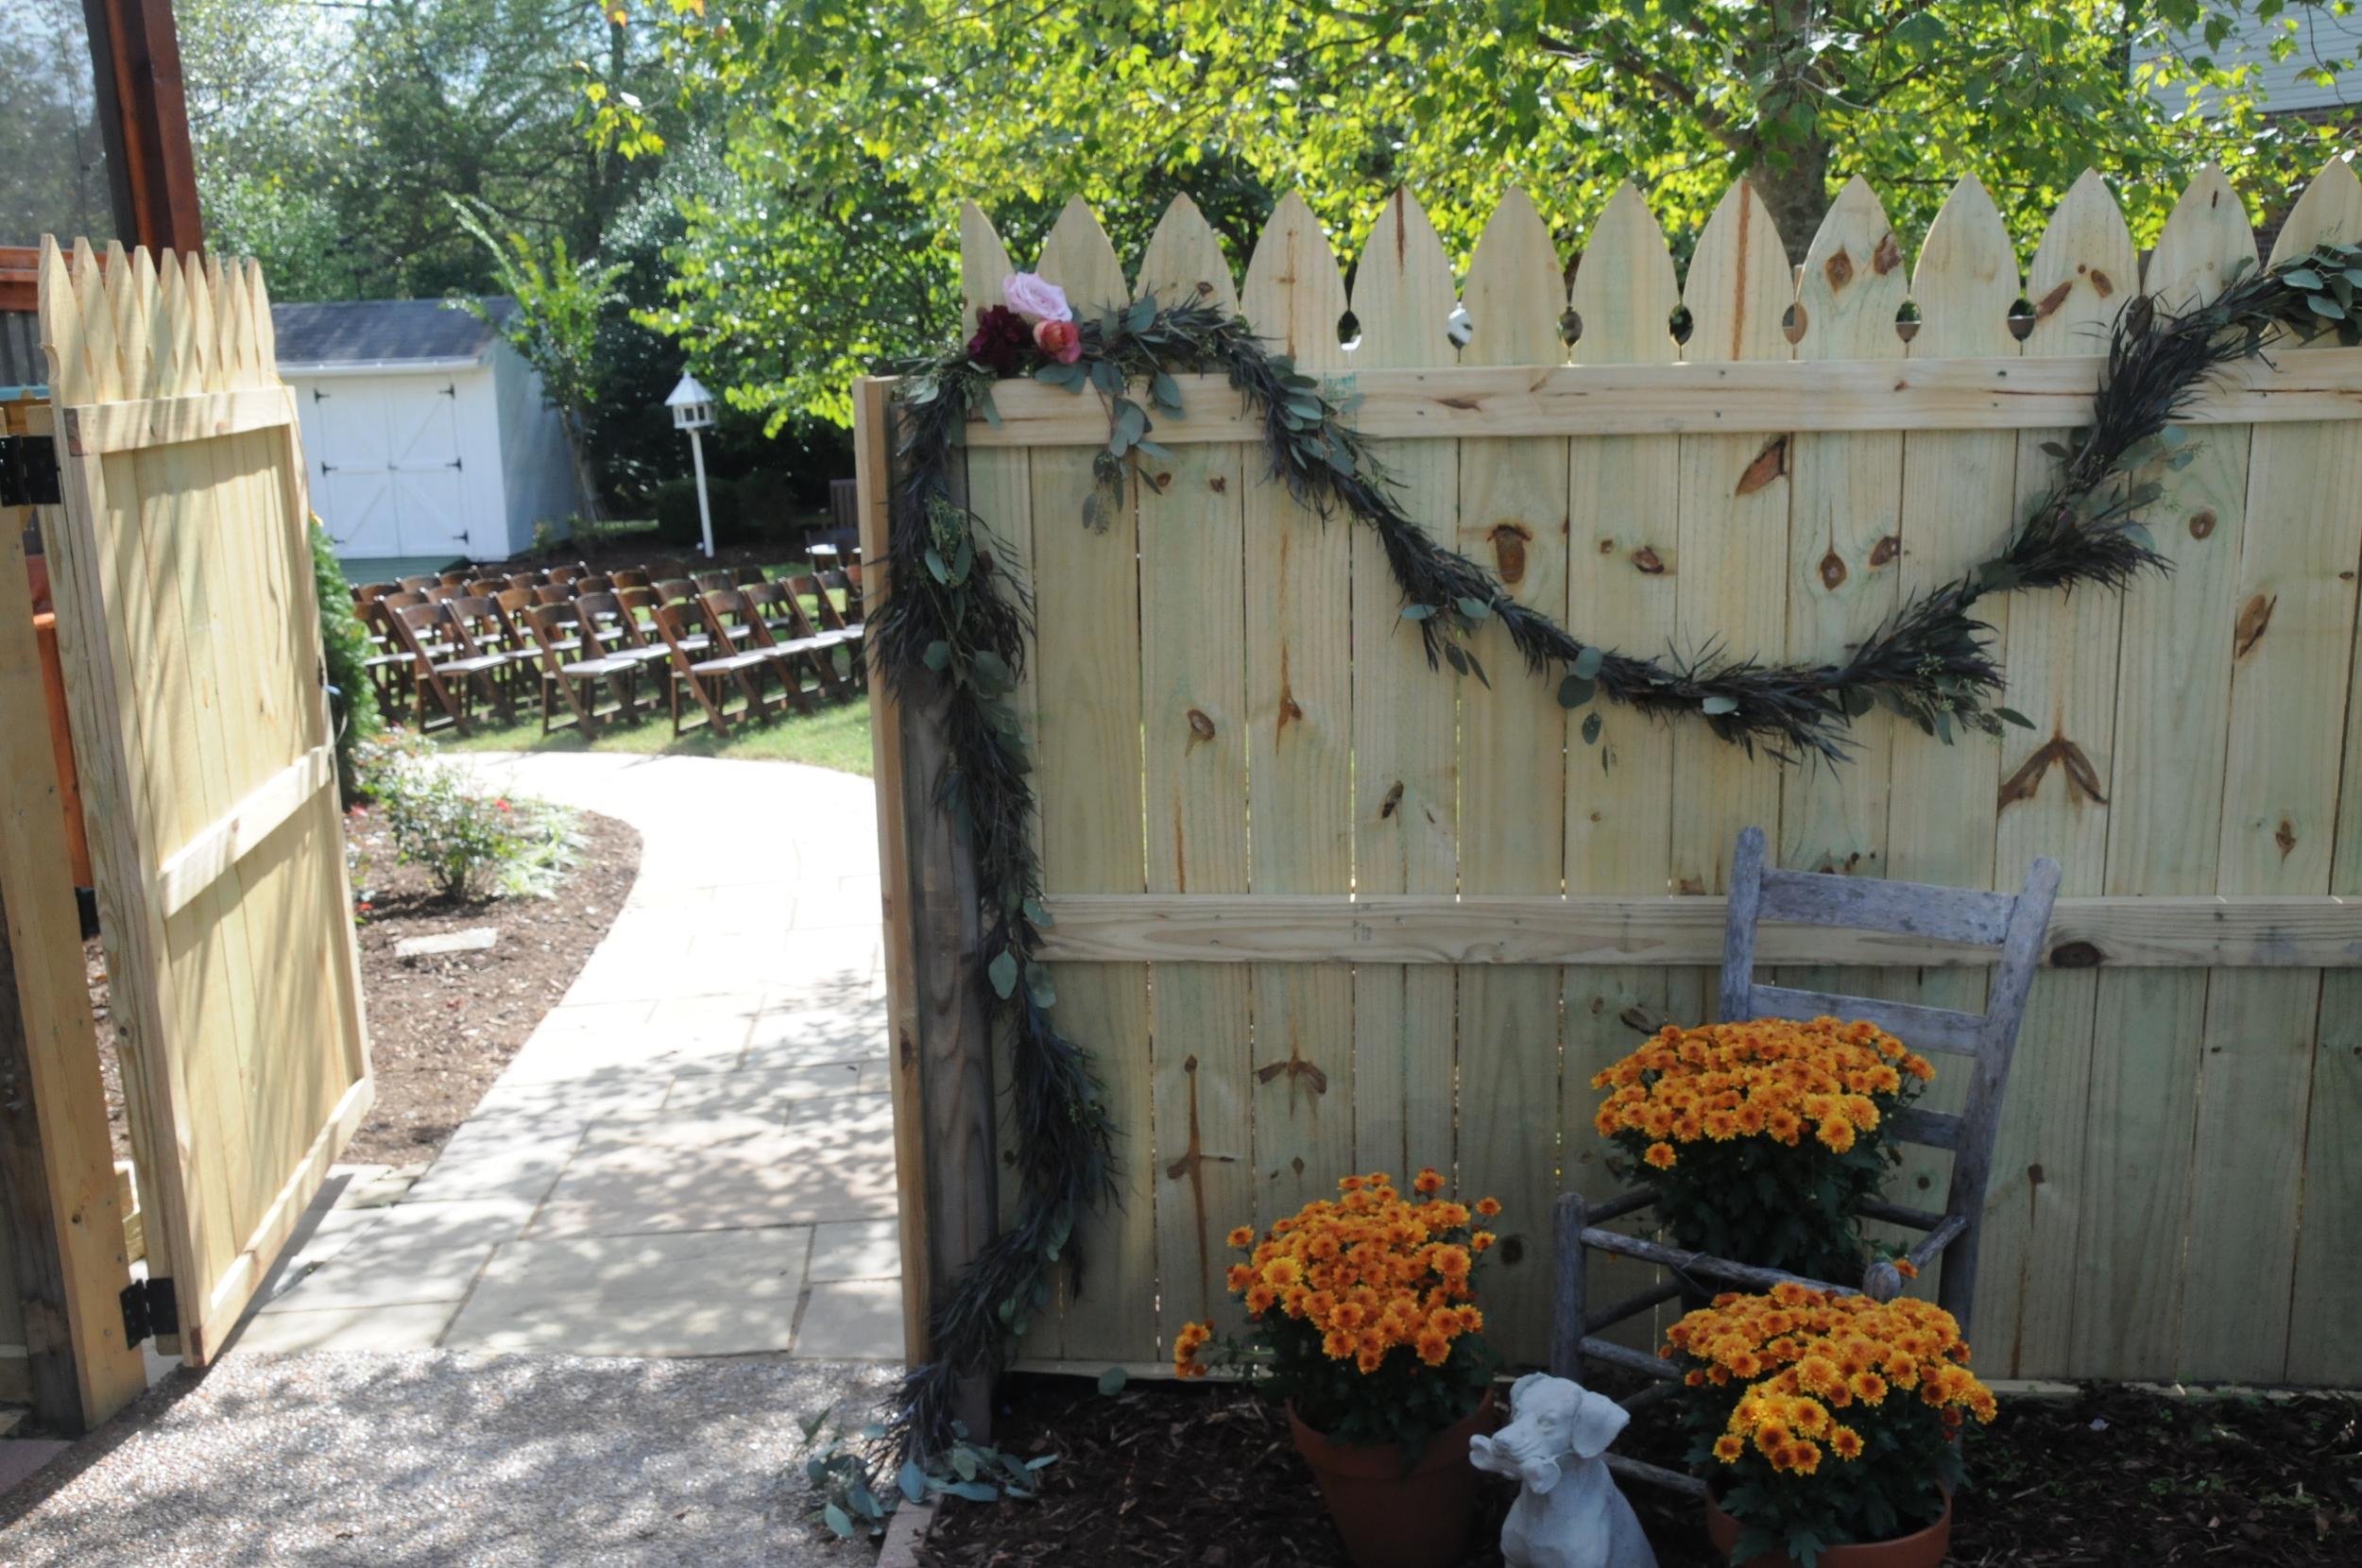 Autumn Garland for a Backyard Wedding